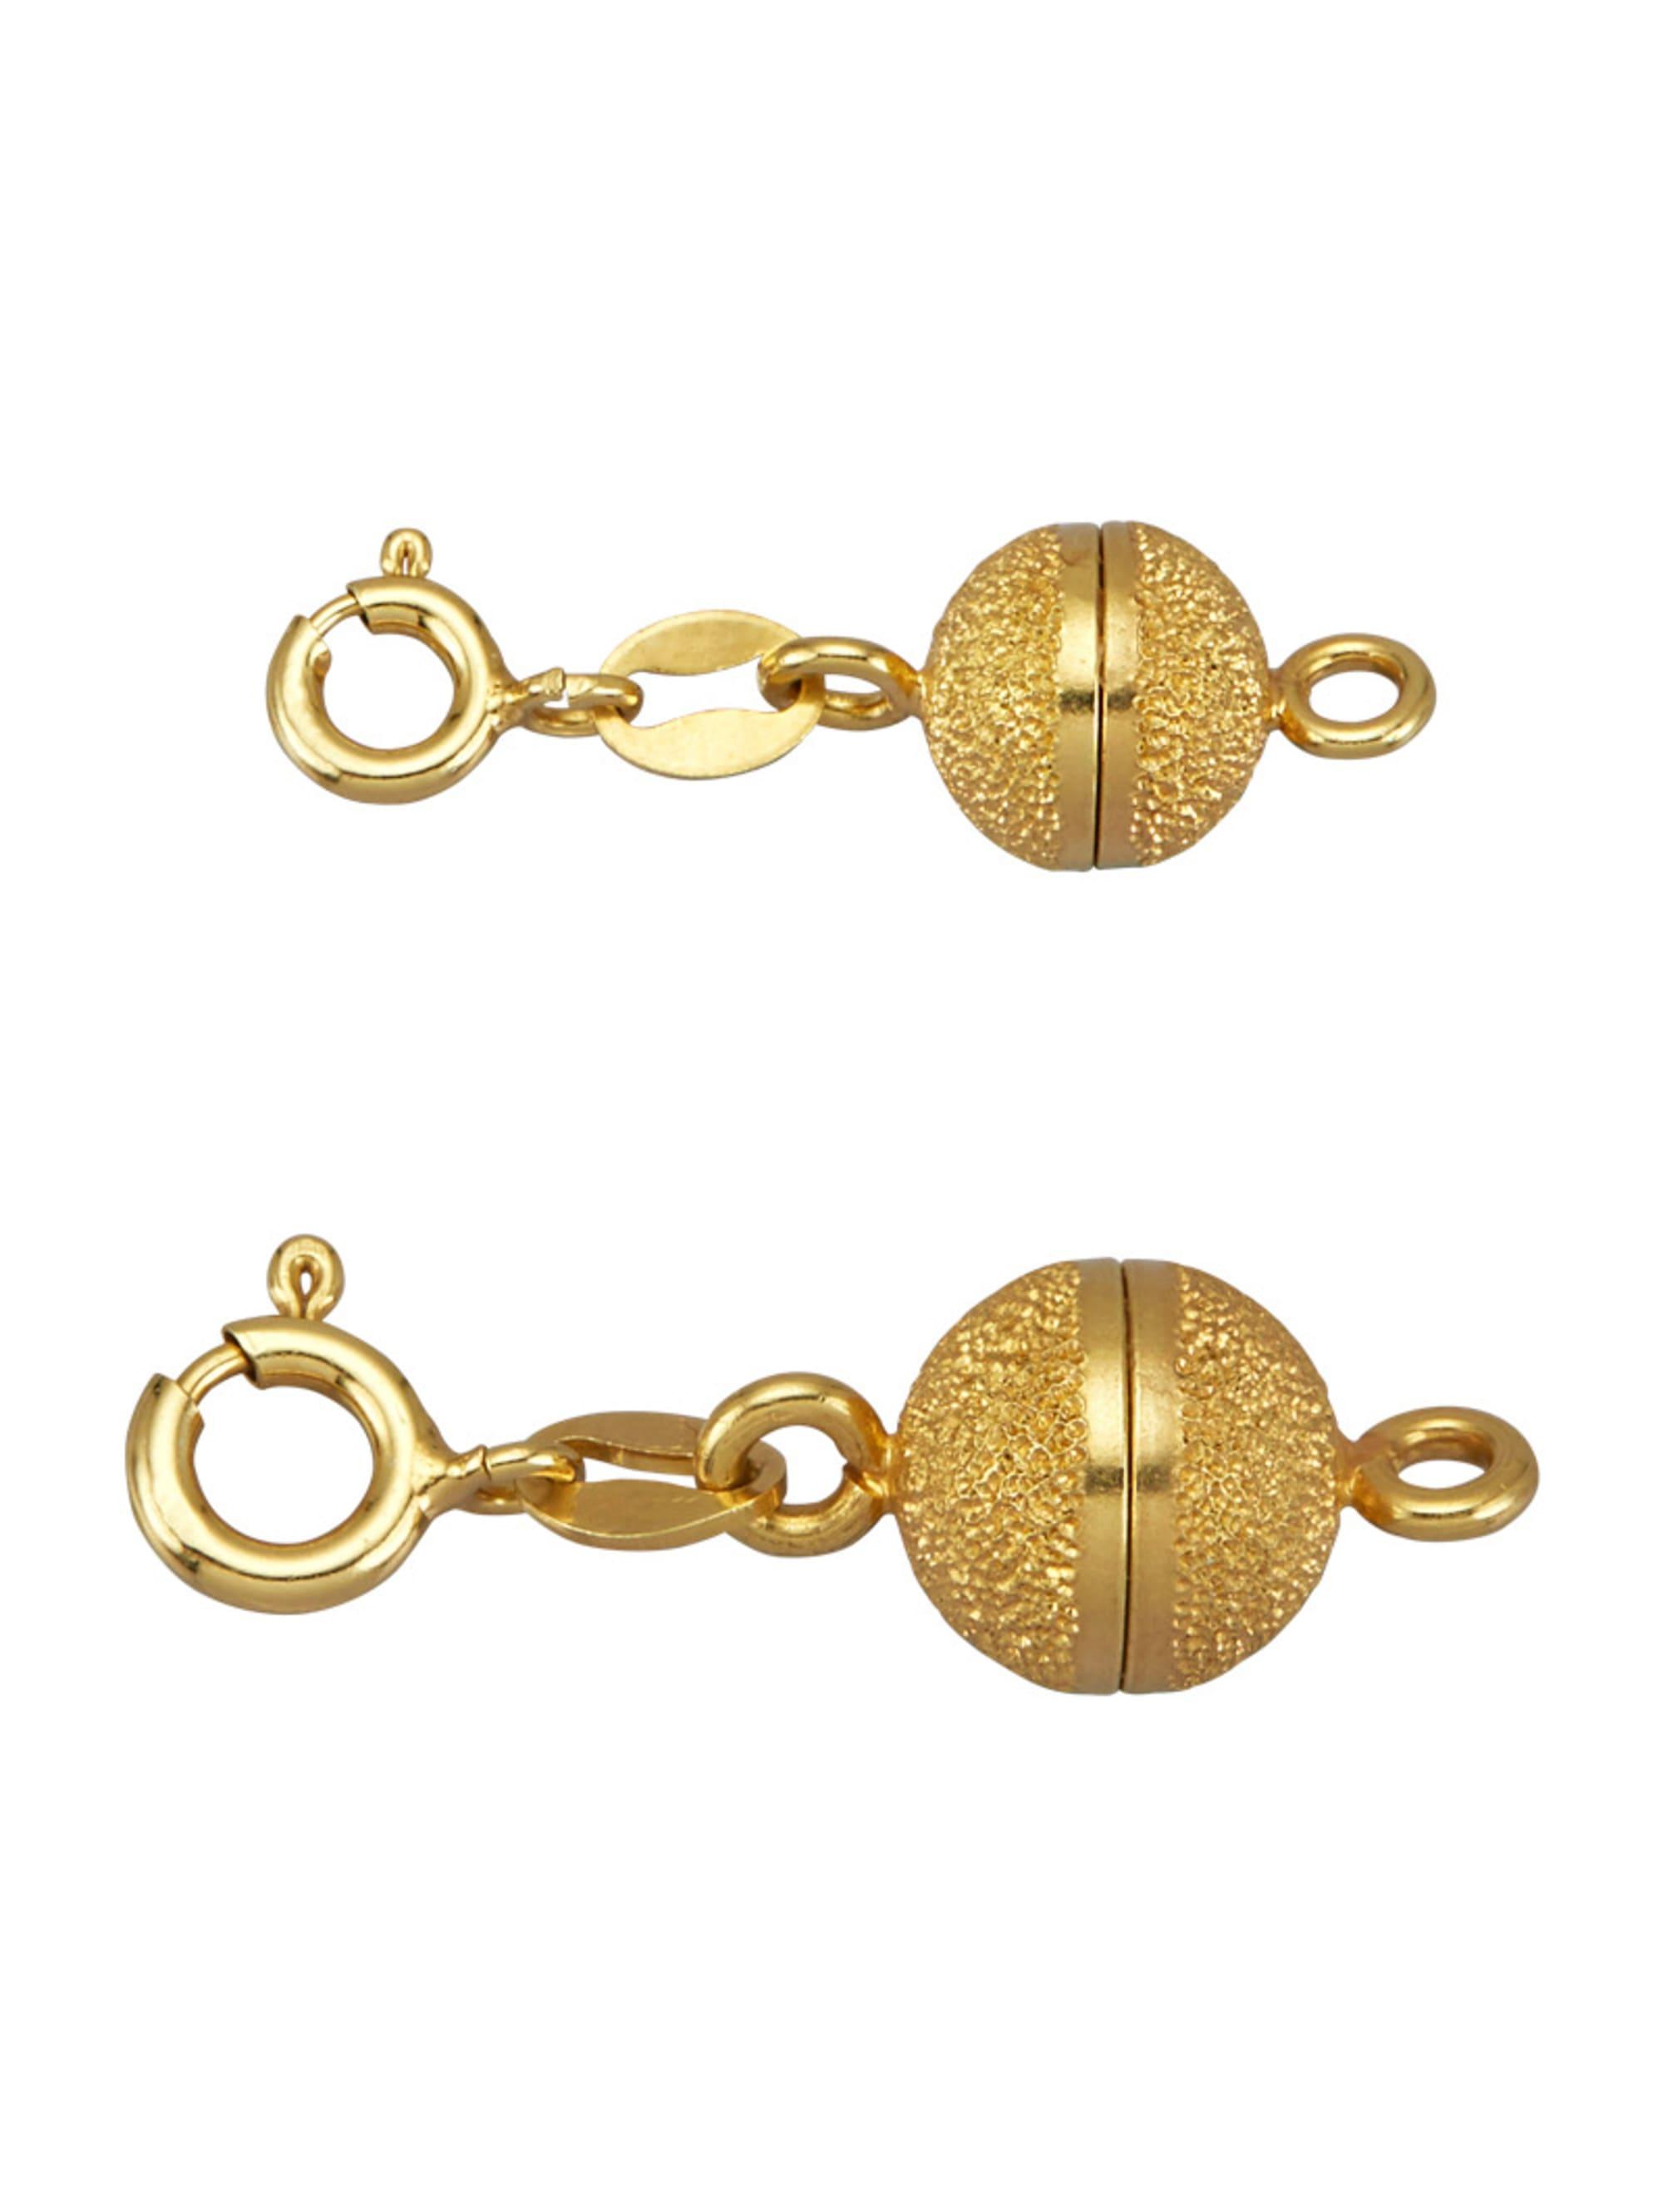 2tlg. Set in Silber 925, vergoldet S6gT1